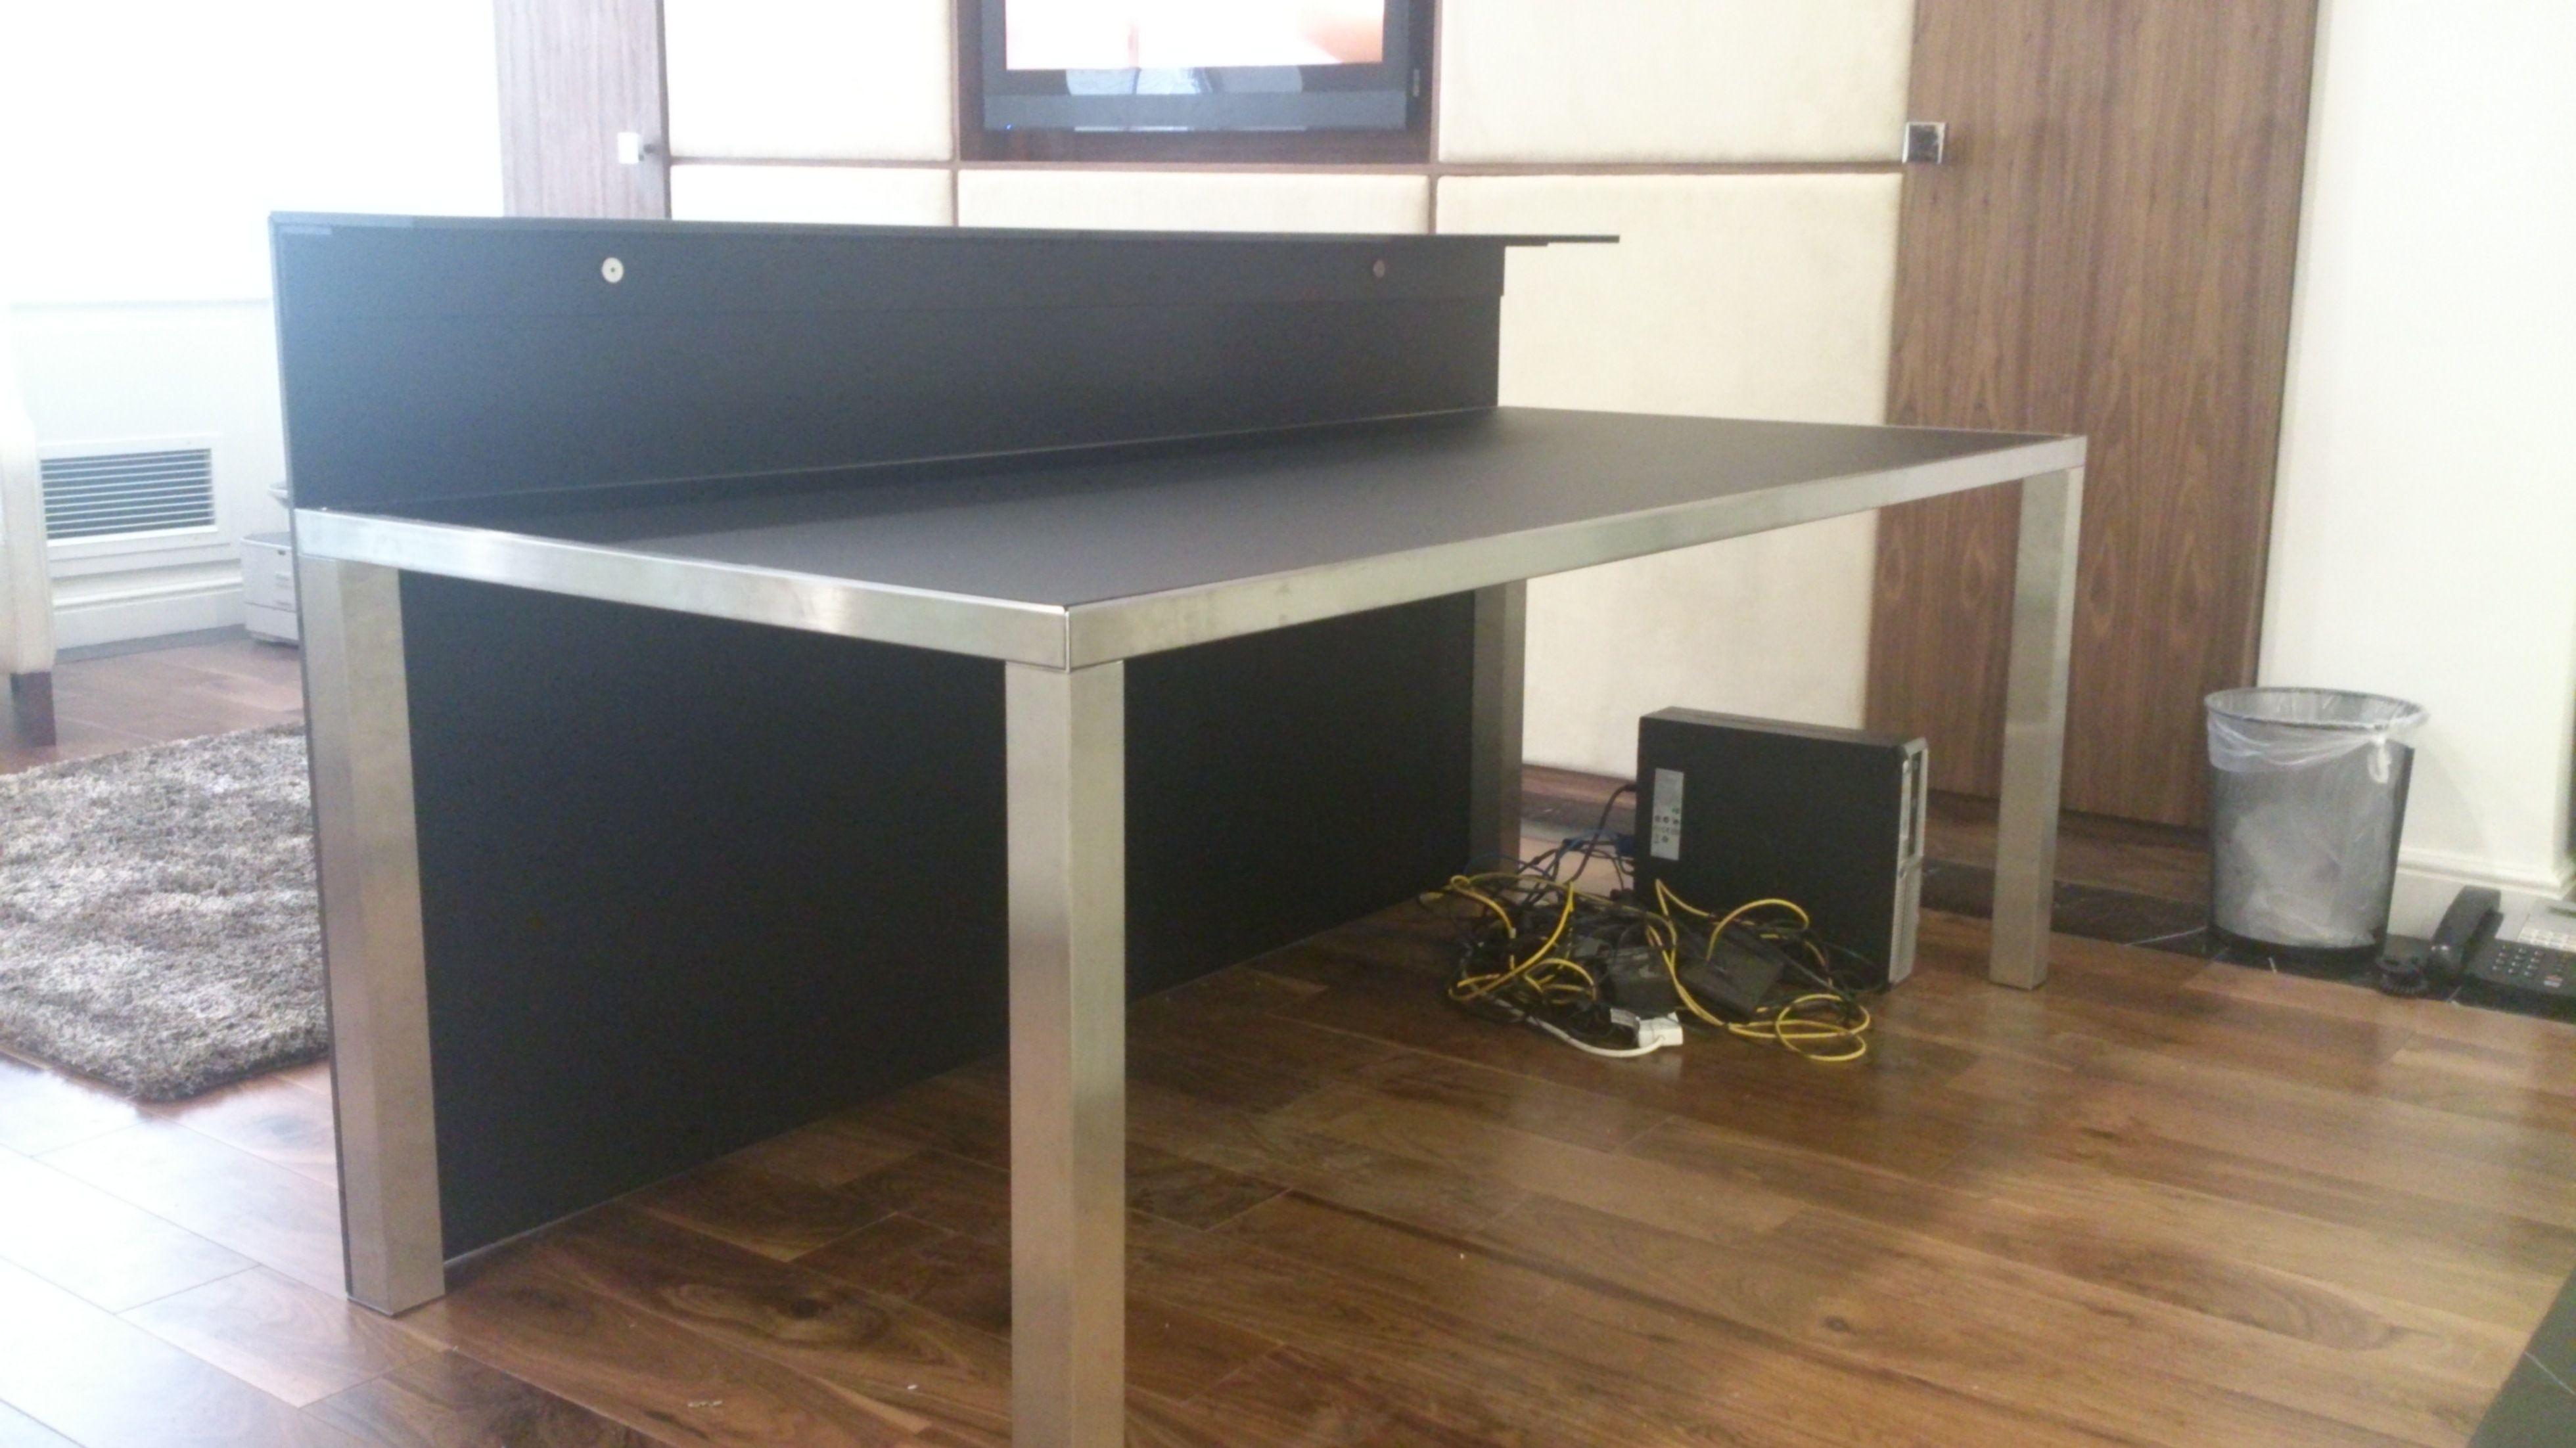 education school lectern for supply china desk tnxnuzhtgrkw speech product digital podium smart multimedia